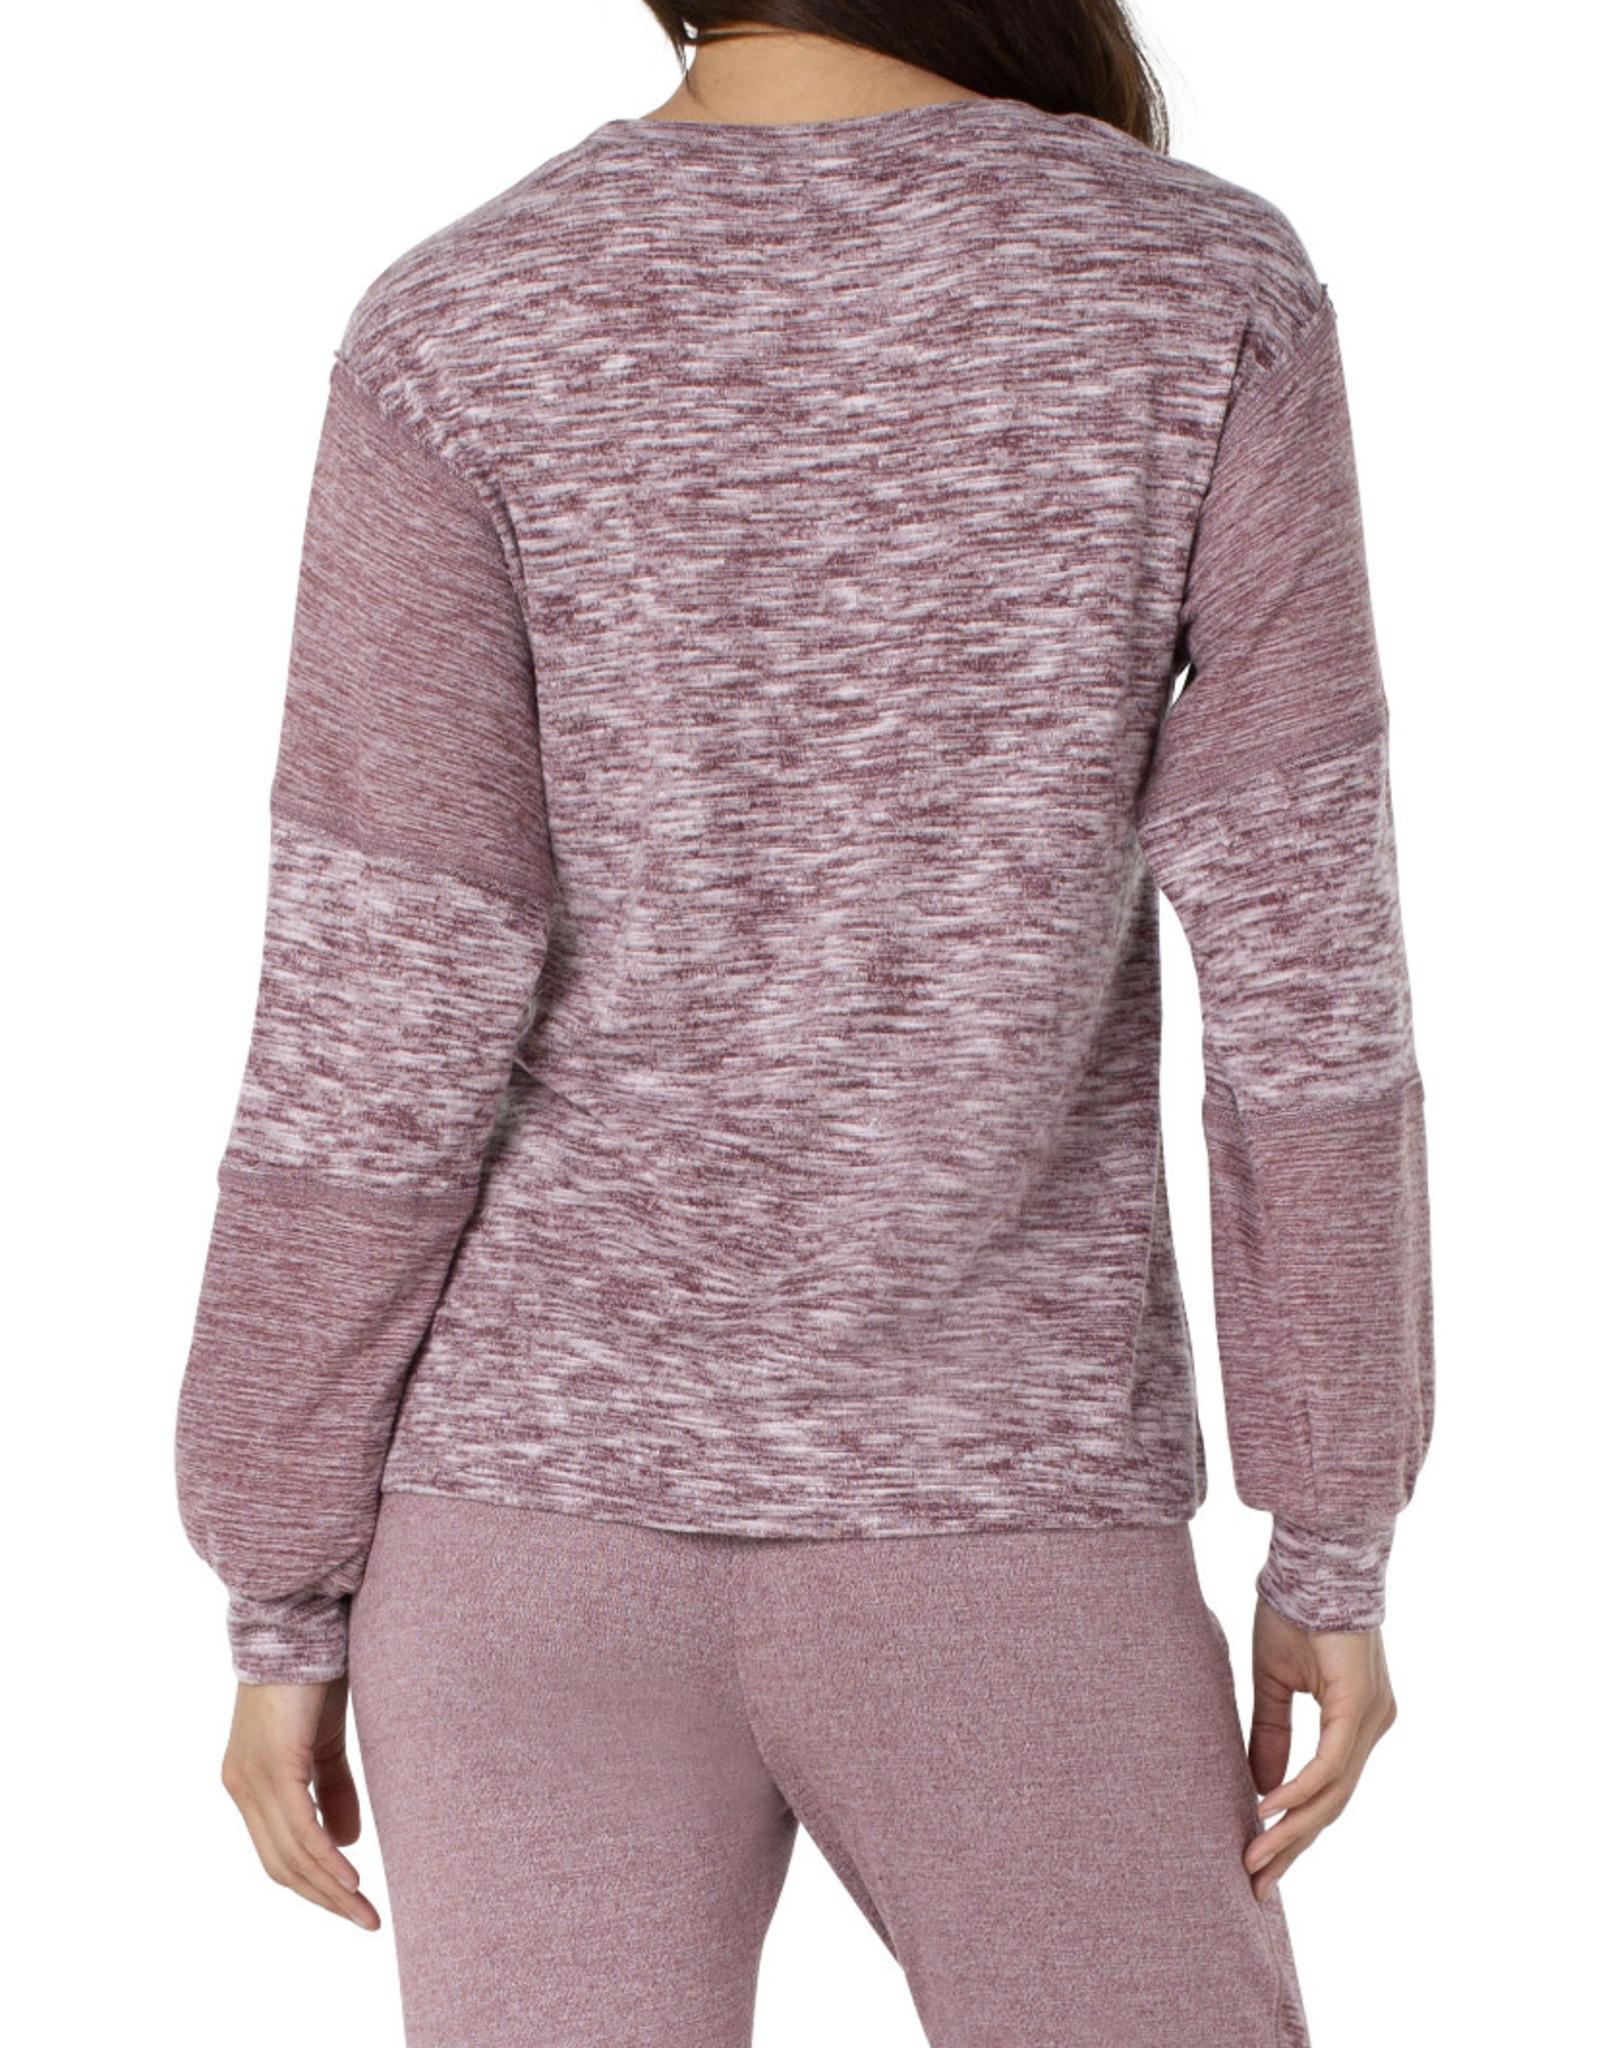 Liverpool Mauve heather pullover